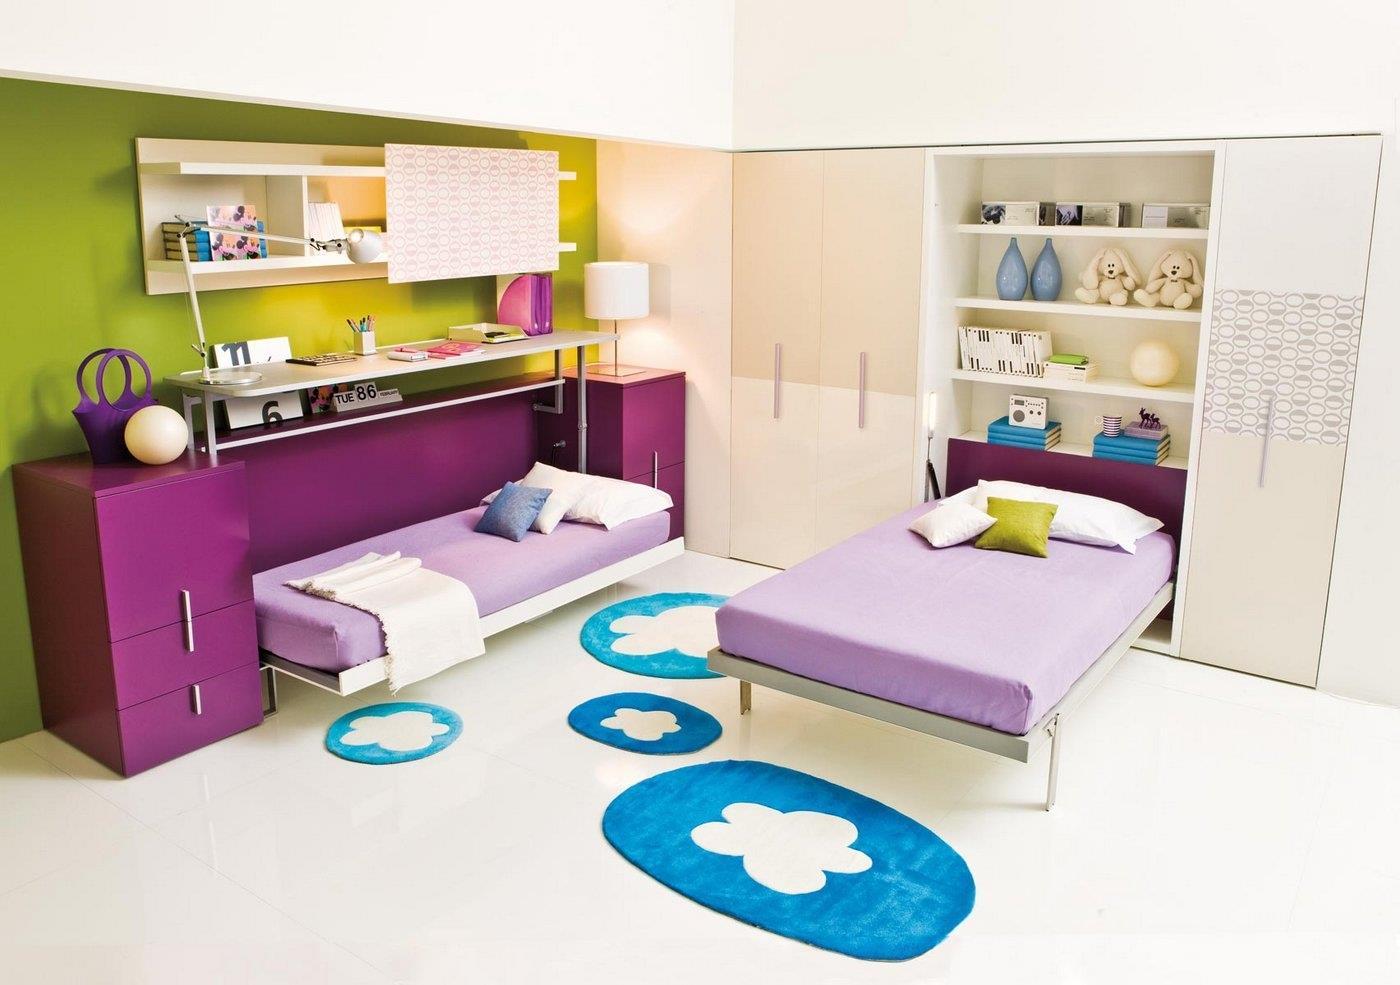 10-mobila-inteligenta-violet-camera-copii